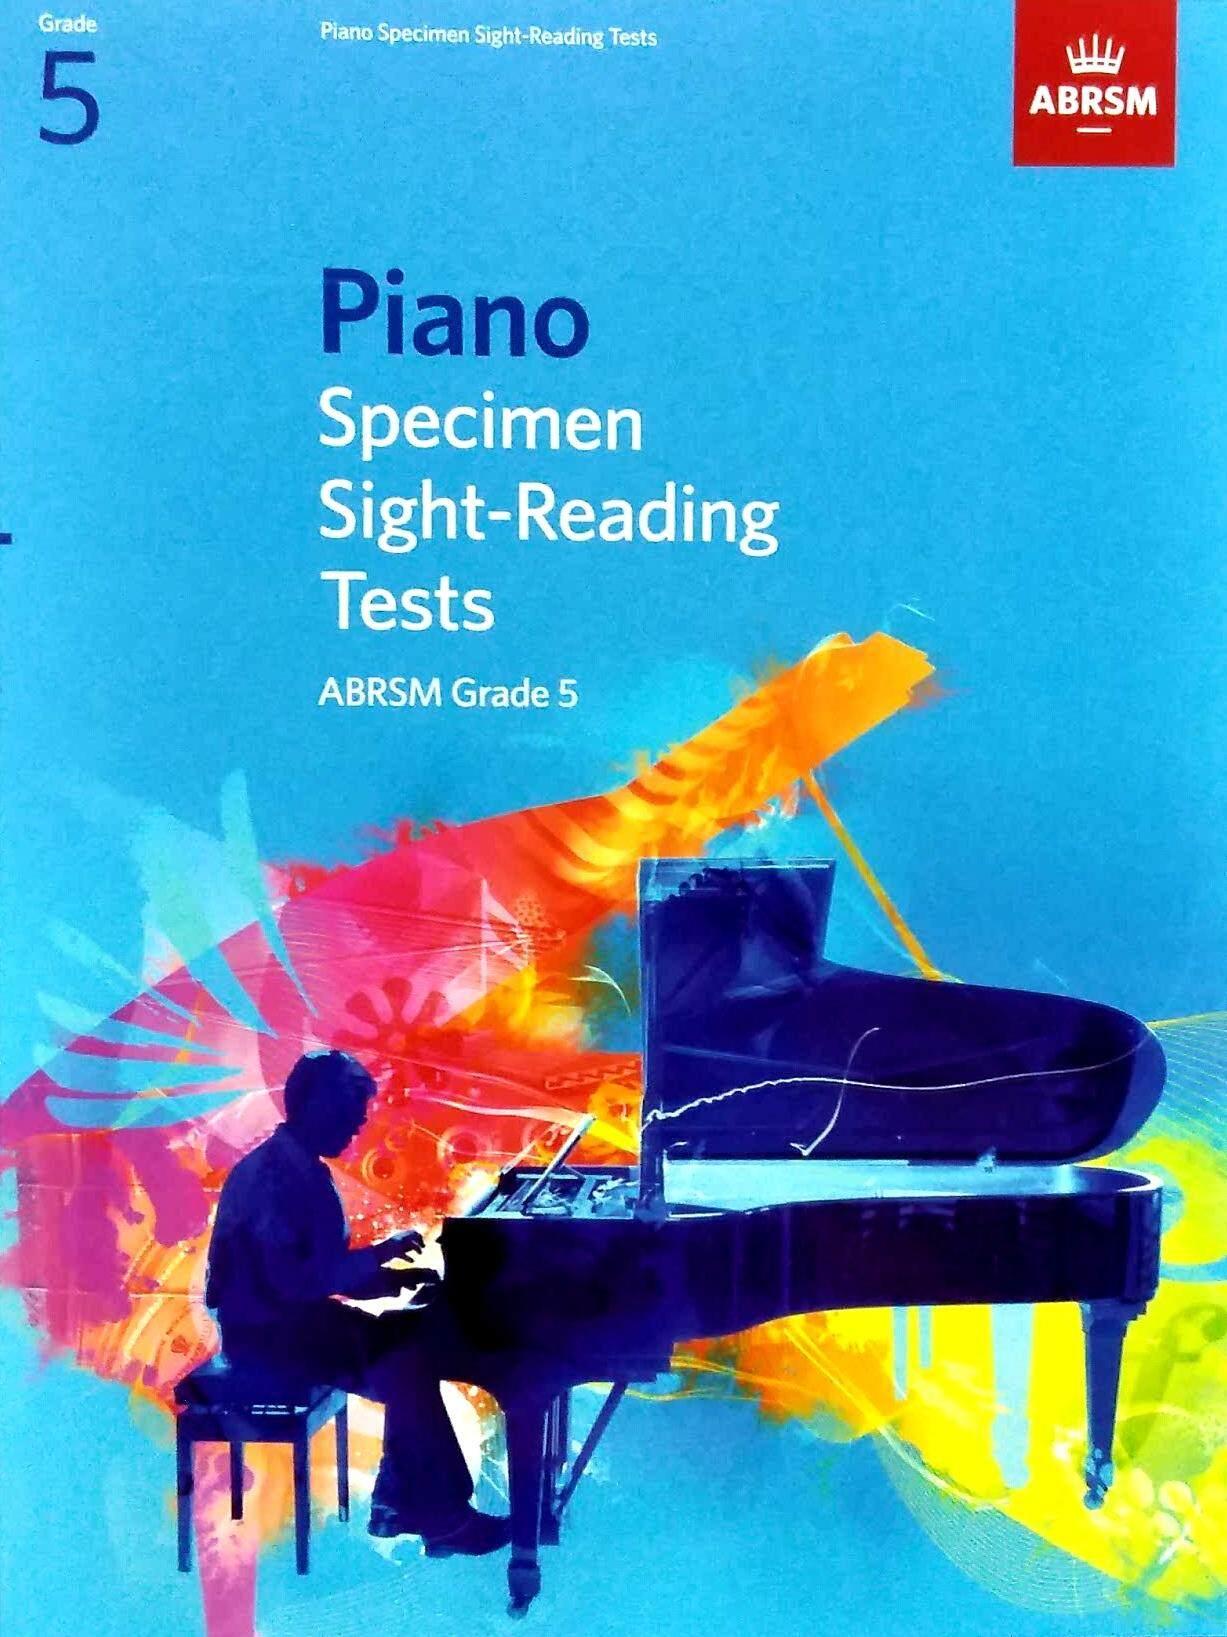 ABRSM Piano Specimen Sight-Reading Tests Grade 5